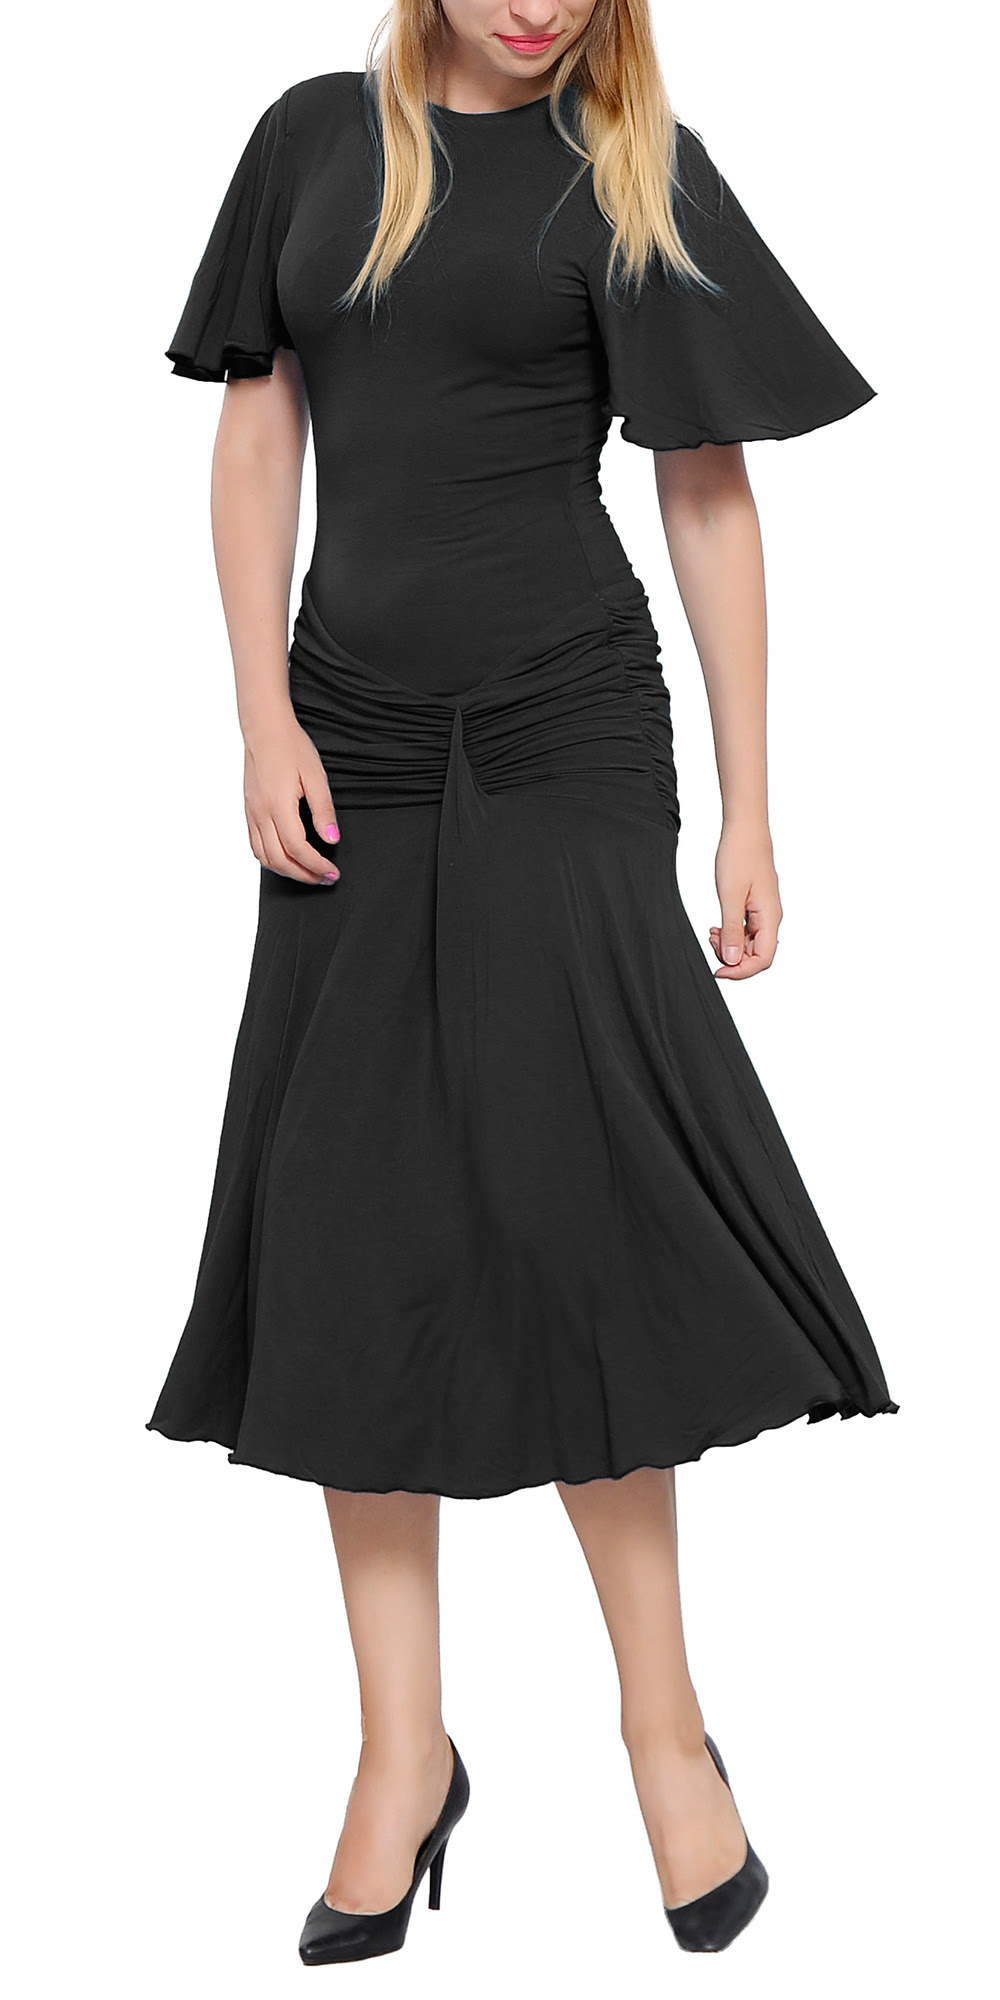 womens drop waist midi dress elegant lady vintage retro